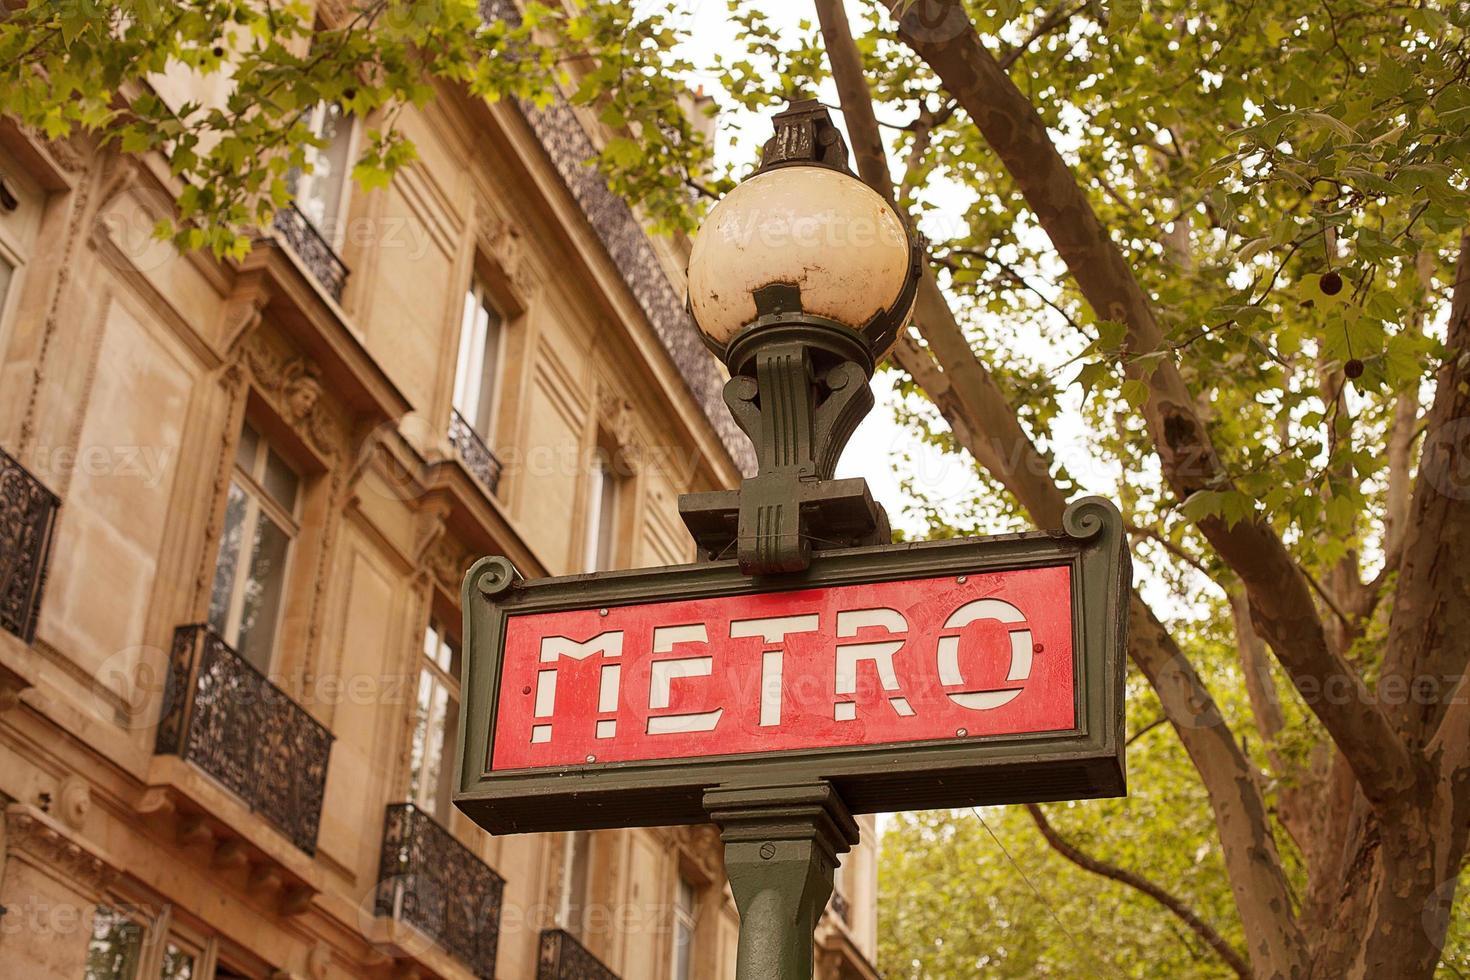 metrostation borden foto